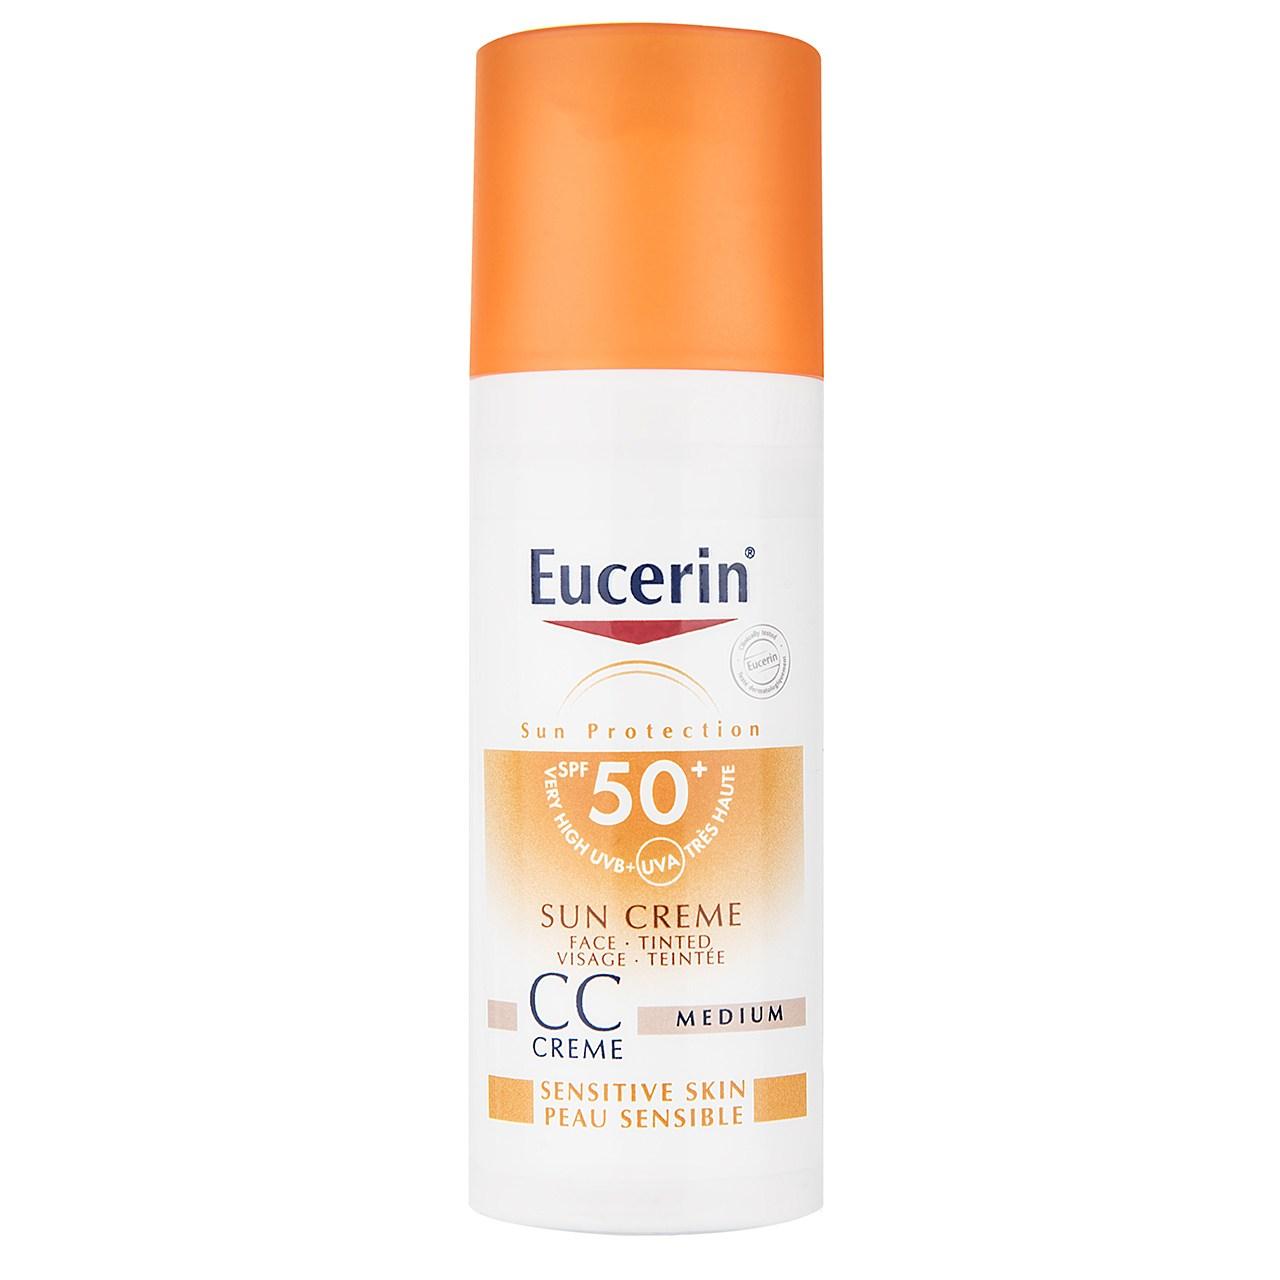 قیمت کرم ضد آفتاب رنگی اوسرین سری Sun Protection Spf50 حجم 50 میلی لیتر